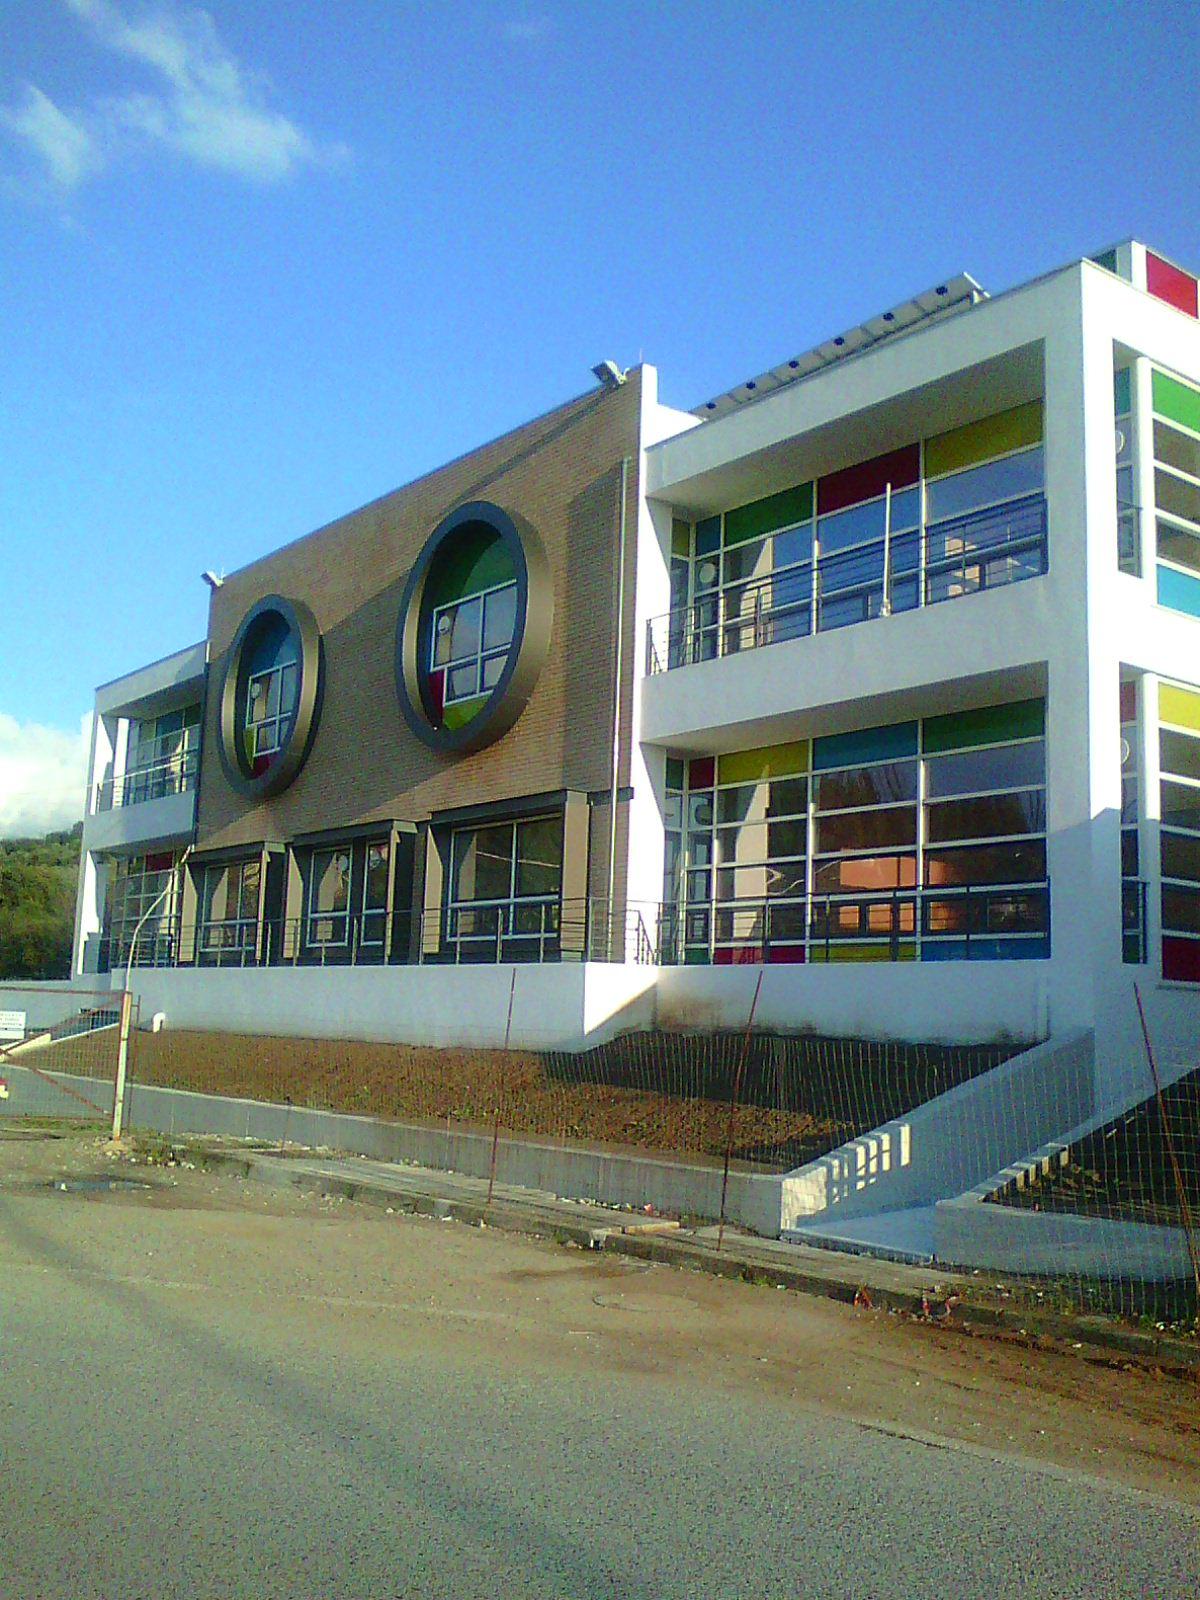 Kαταγγελία του Συλλόγου Δασκάλων για τη μη μεταφορά του Δημοτικού- Νηπιαγωγείου ΕΛΕΠΑΠ  στο νέο κτίριο